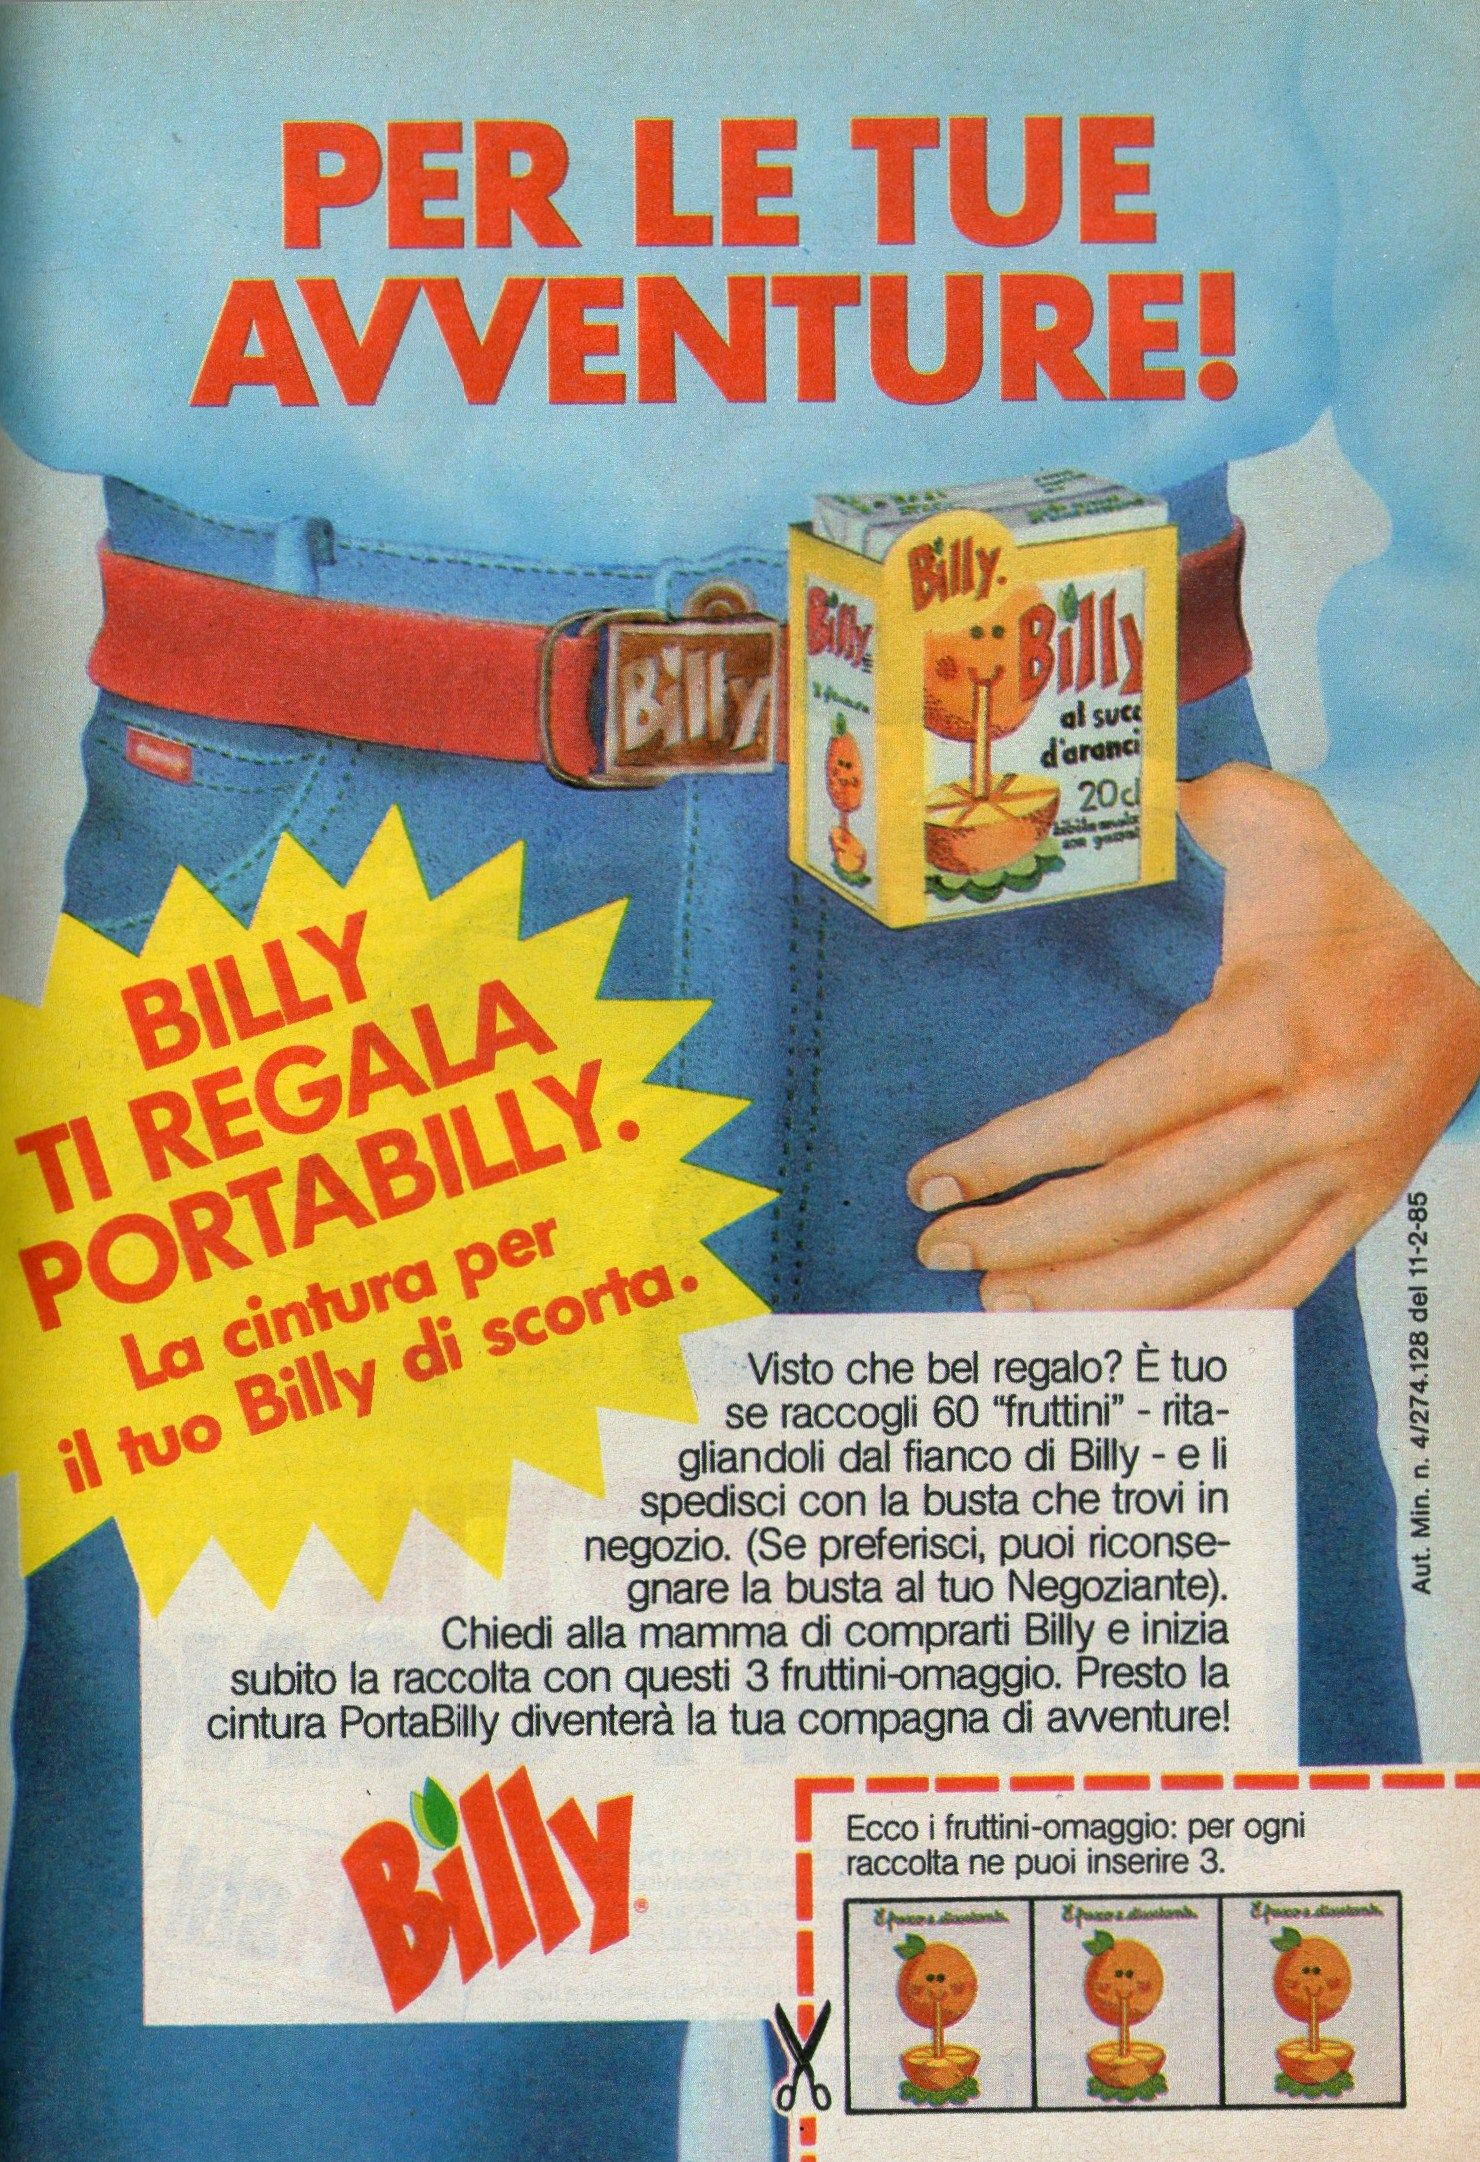 Billy vintage ad